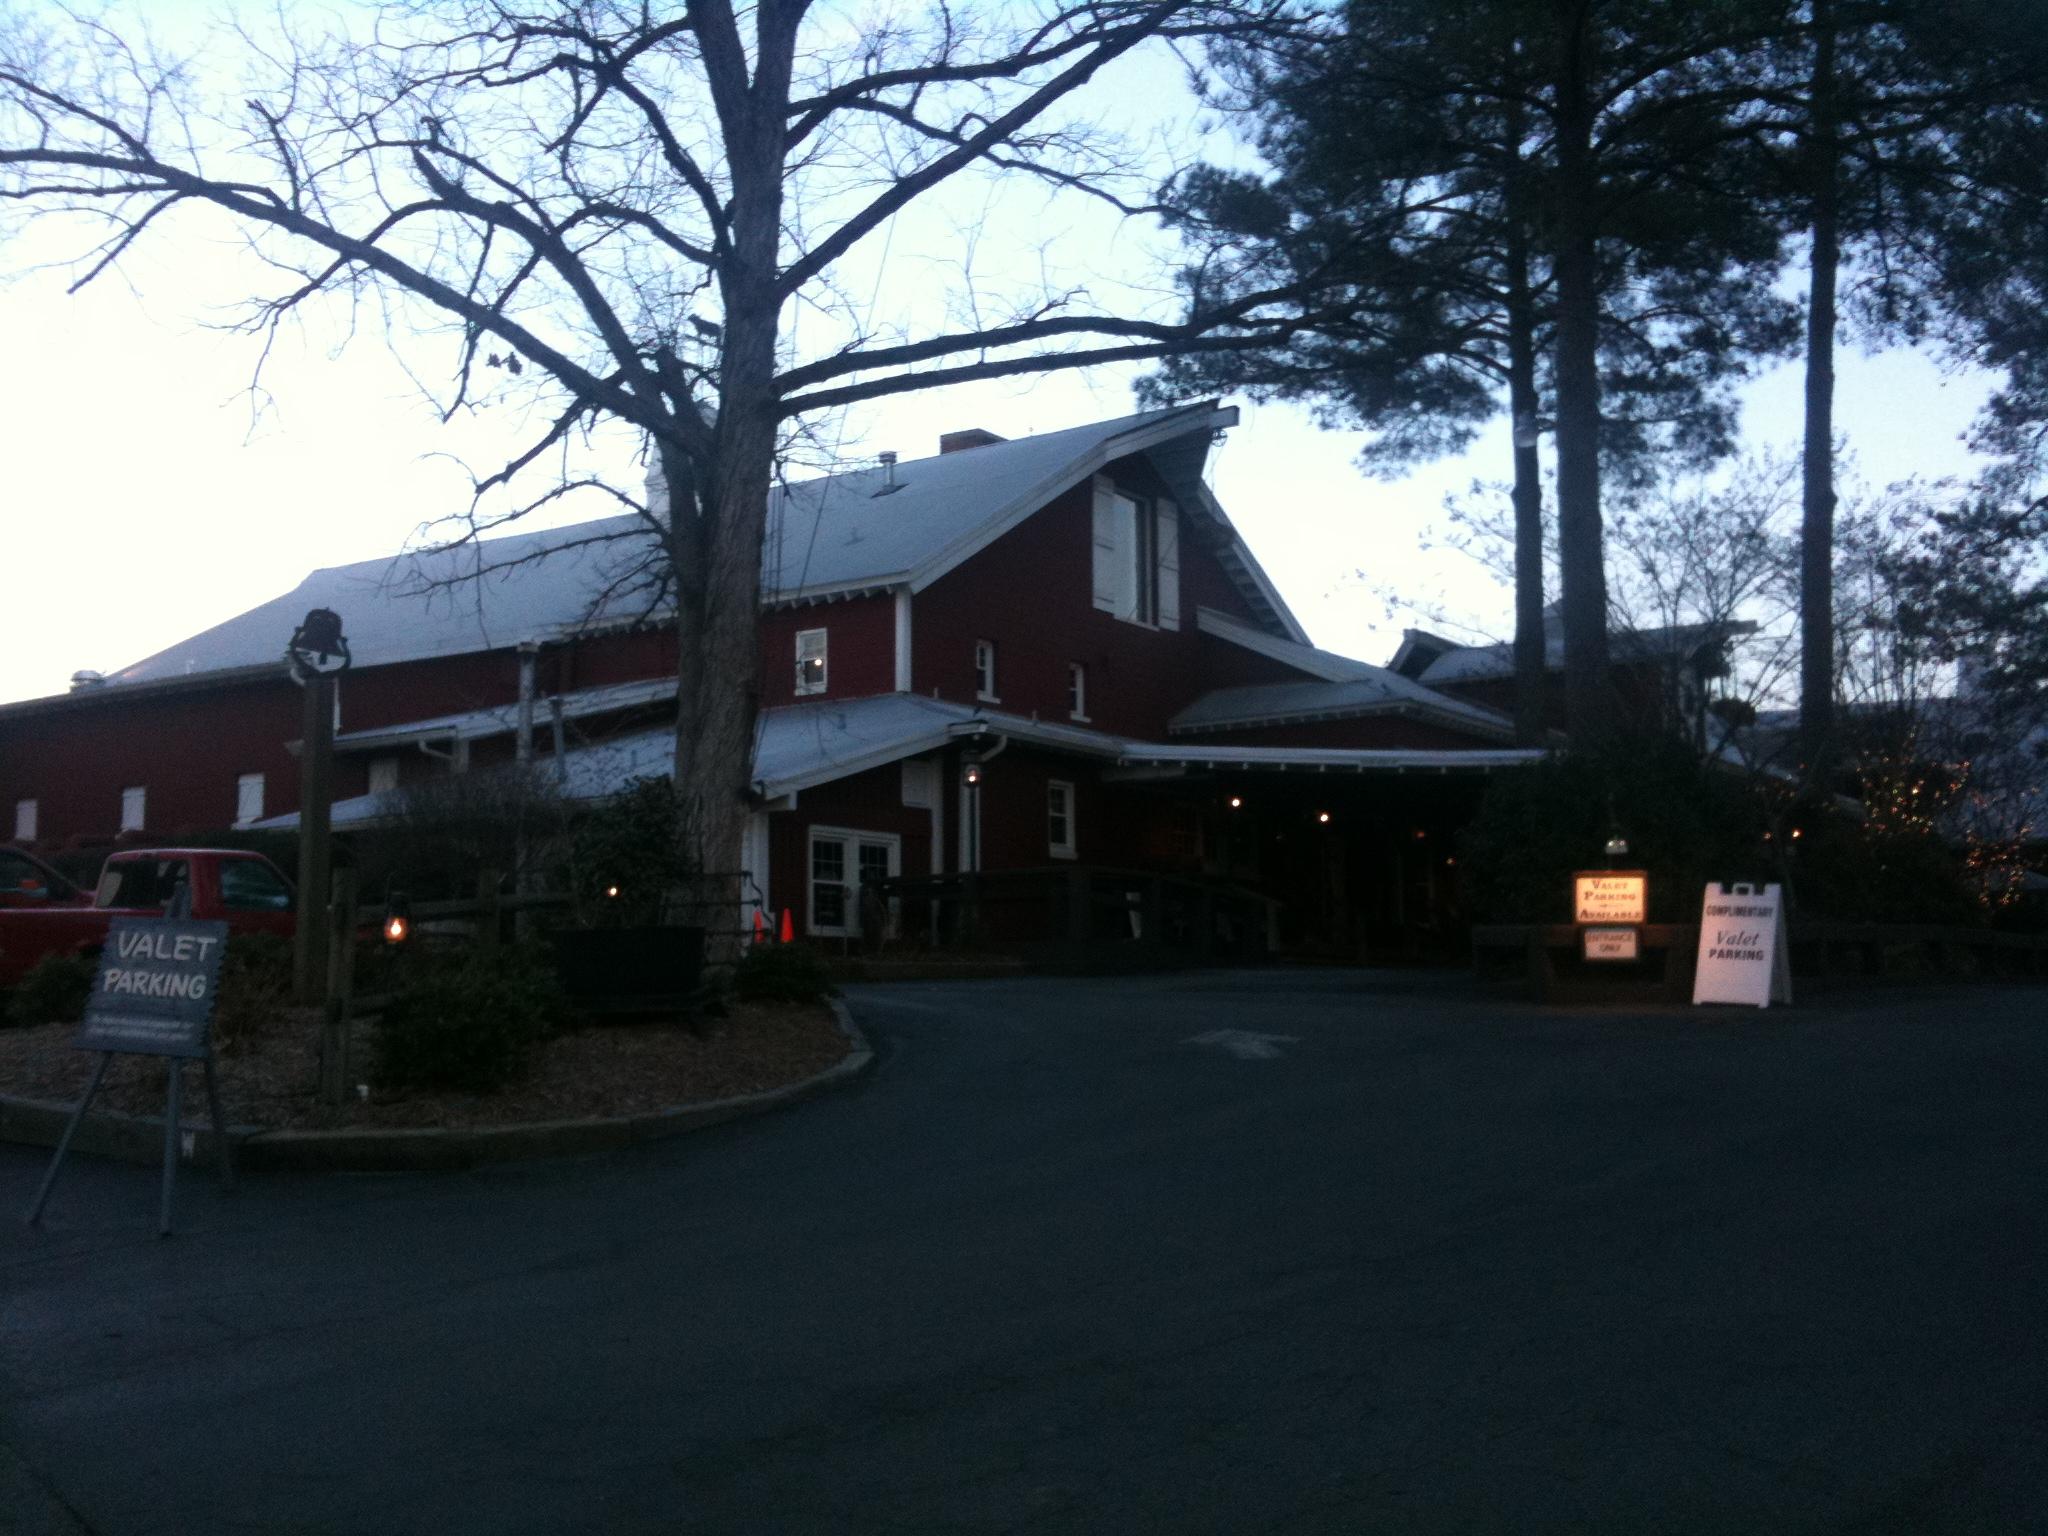 Angus Barn in Raleigh